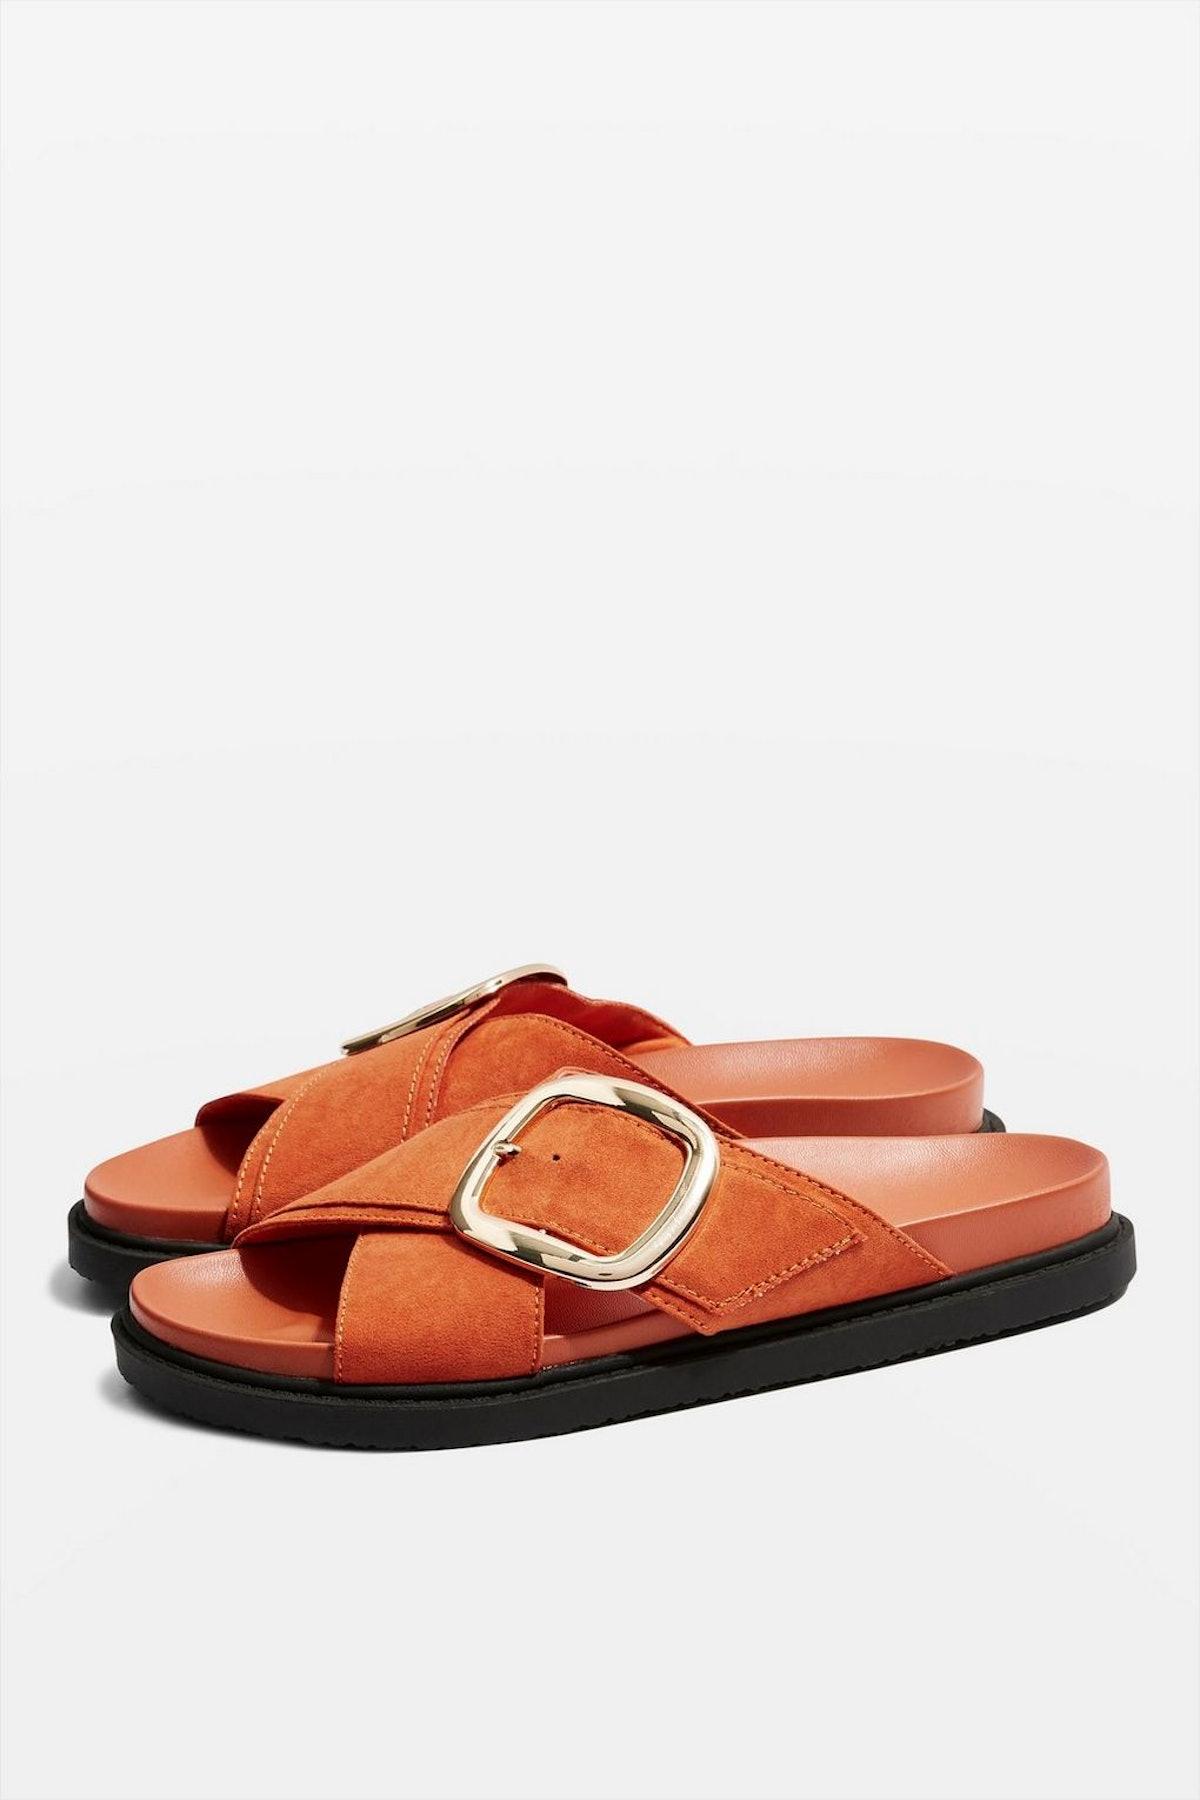 ROMEO Buckle Sandals